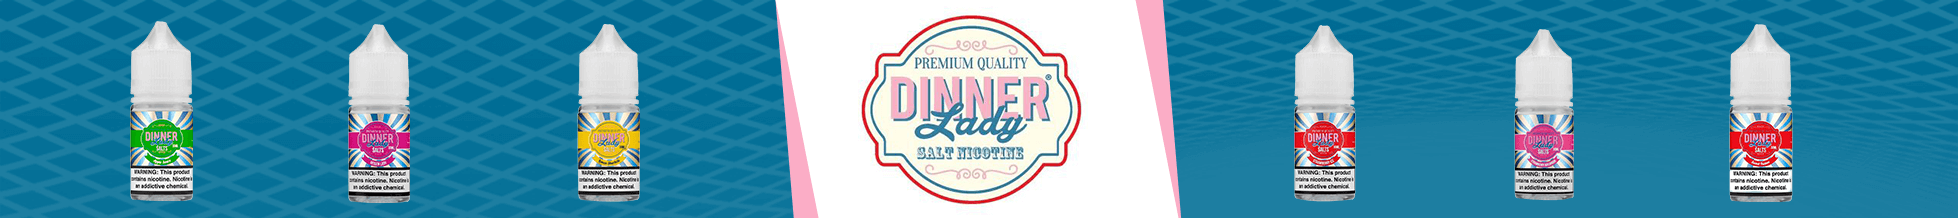 dinner-lady-salt.png